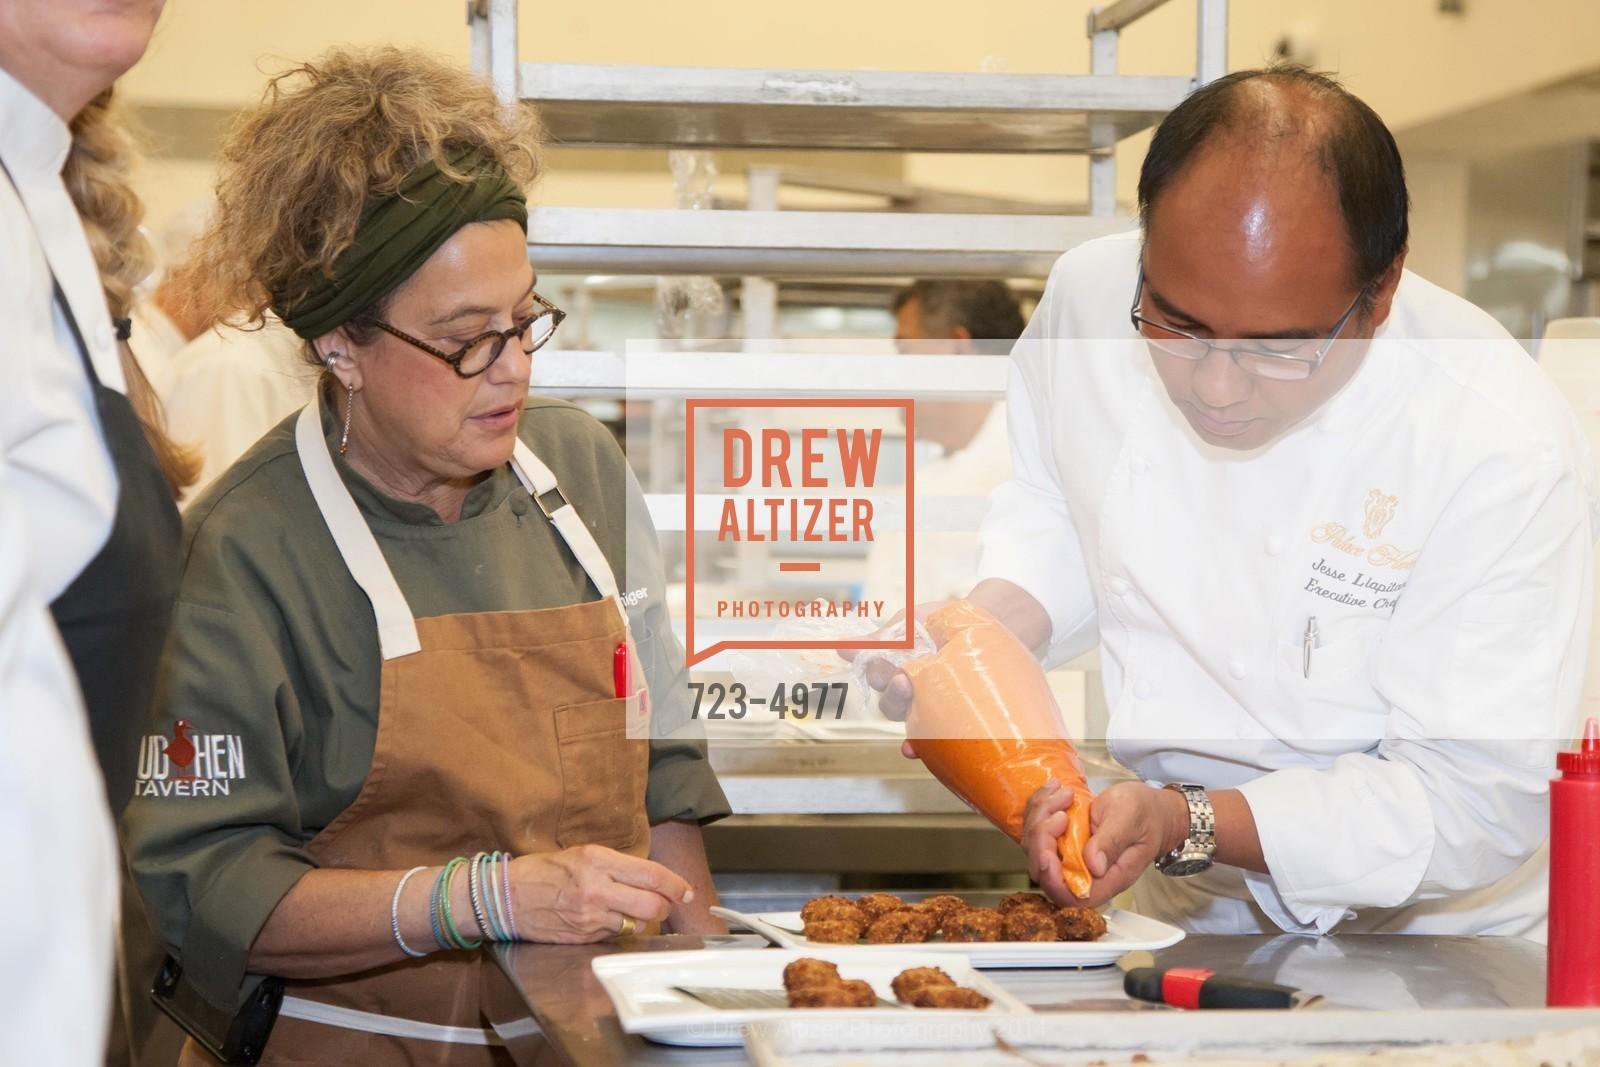 Susan Feniger, Executive Chef Jesse Llapitan, Photo #723-4977